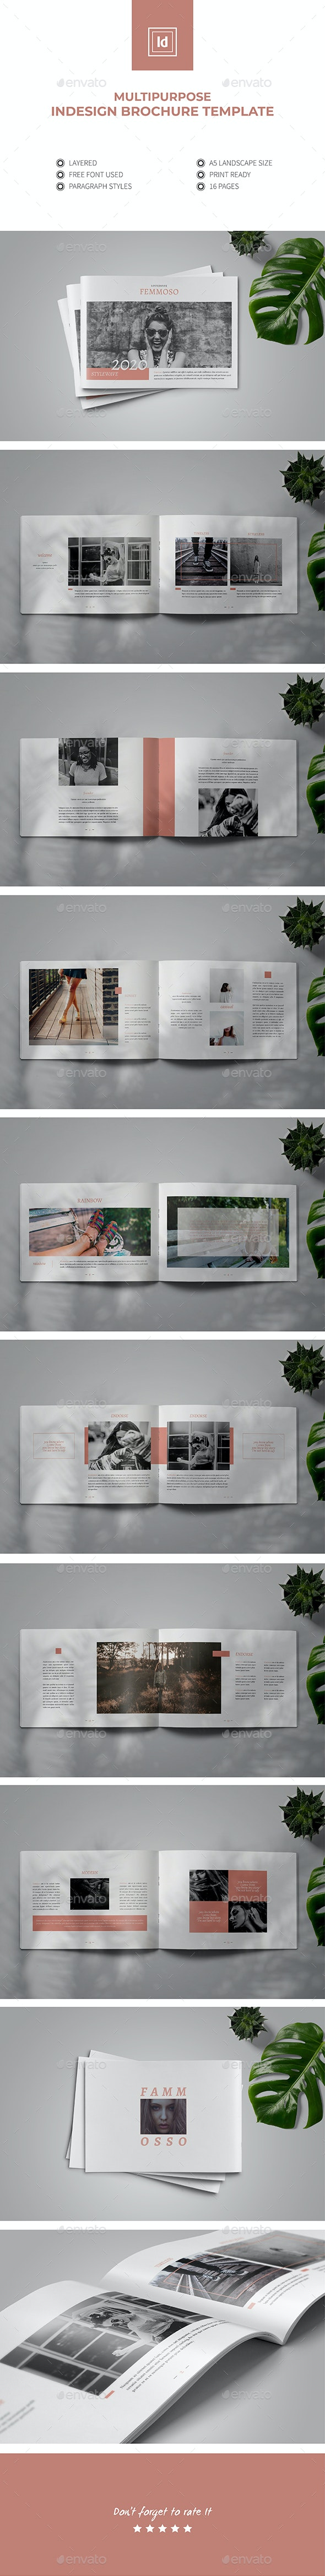 Multipurpose Clean Indesign Brochure Template - Brochures Print Templates